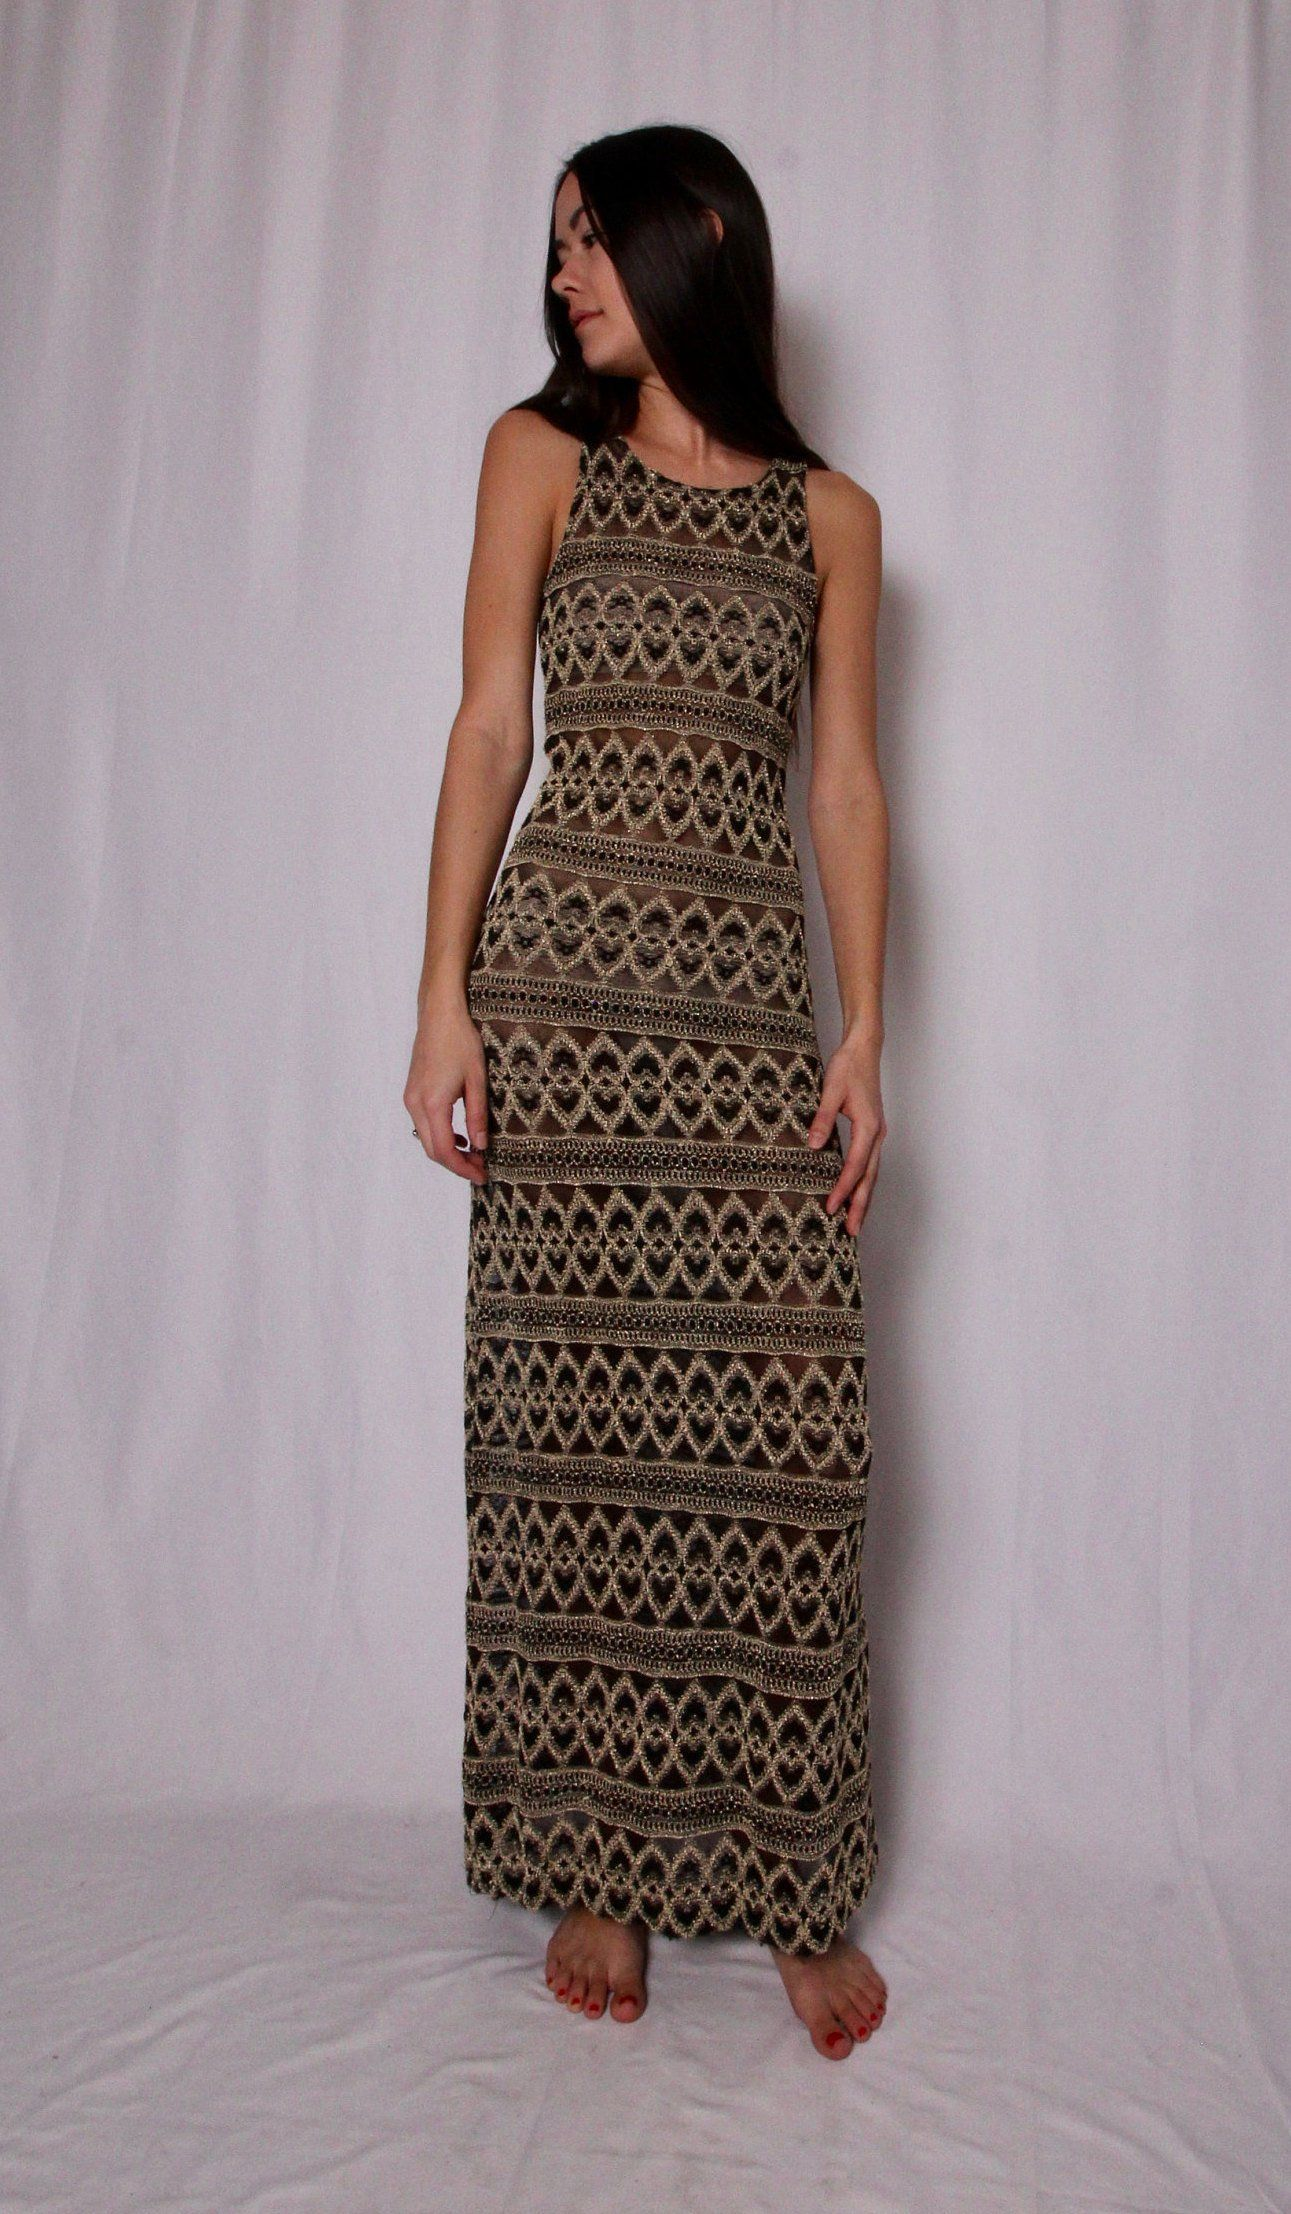 Summer Dress Abstract Dress Gypsy Dress 90s Dress Aztec Dress Hippie Dress Floral Dress Vintage Dress Boho Dress Festival Dress